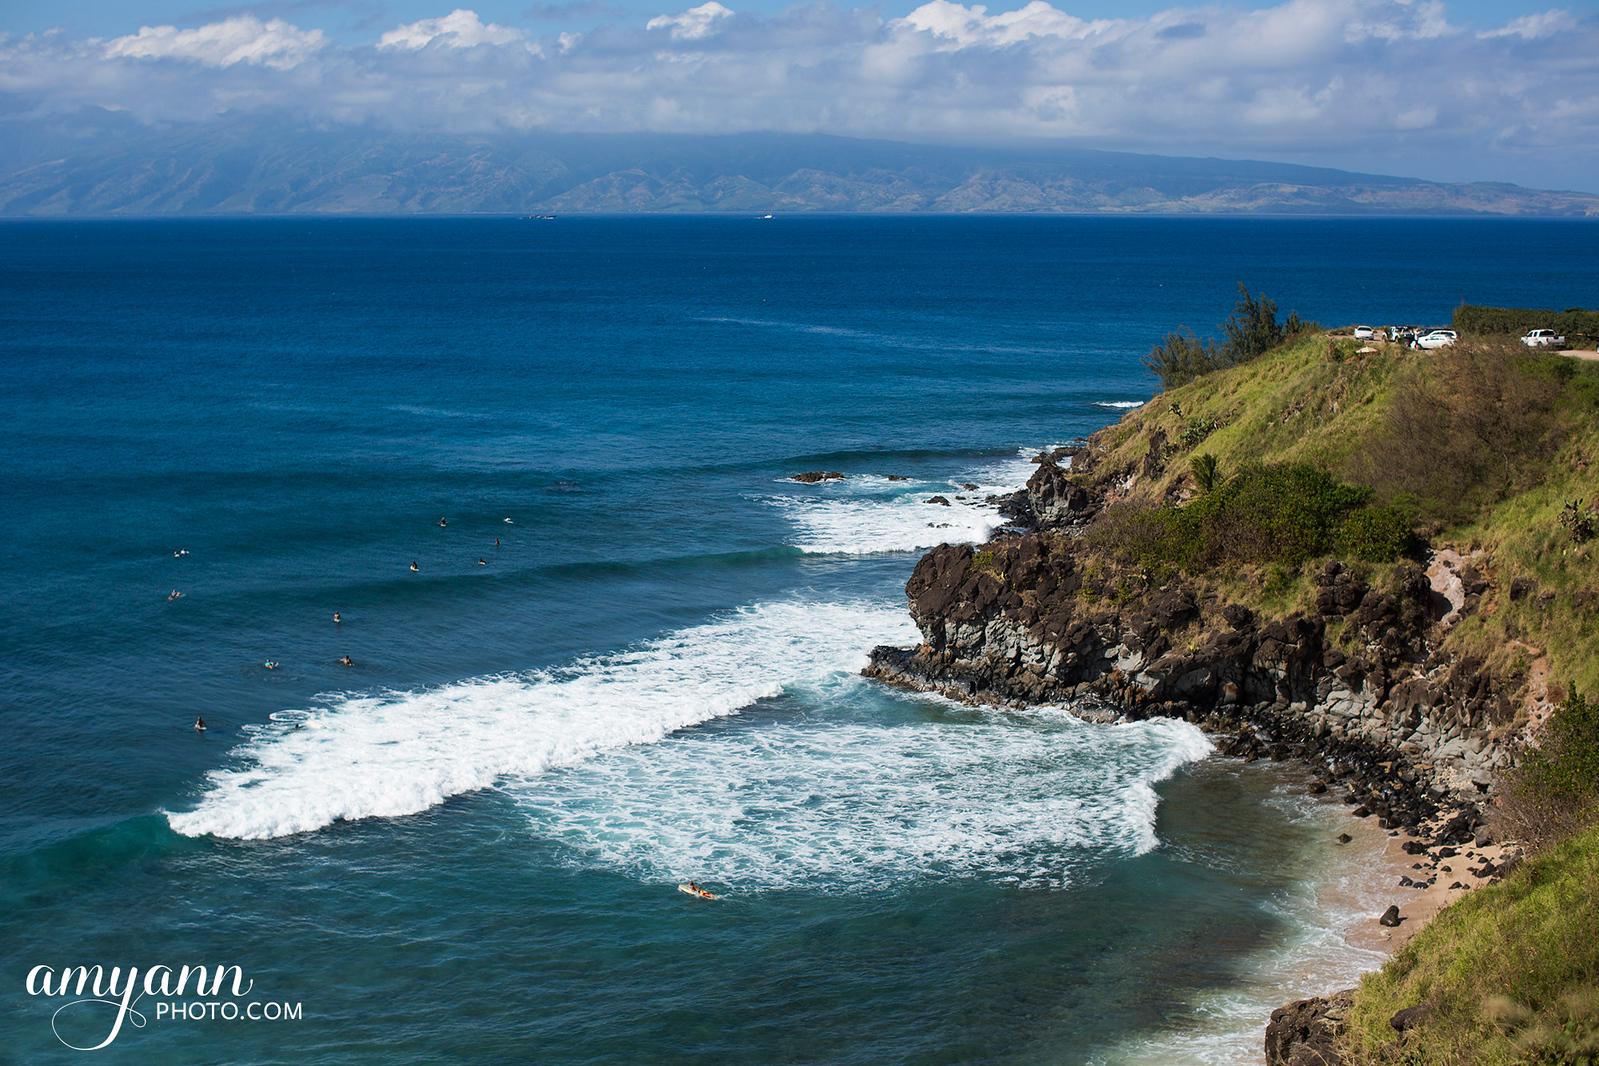 hawaii_amyannphoto_14